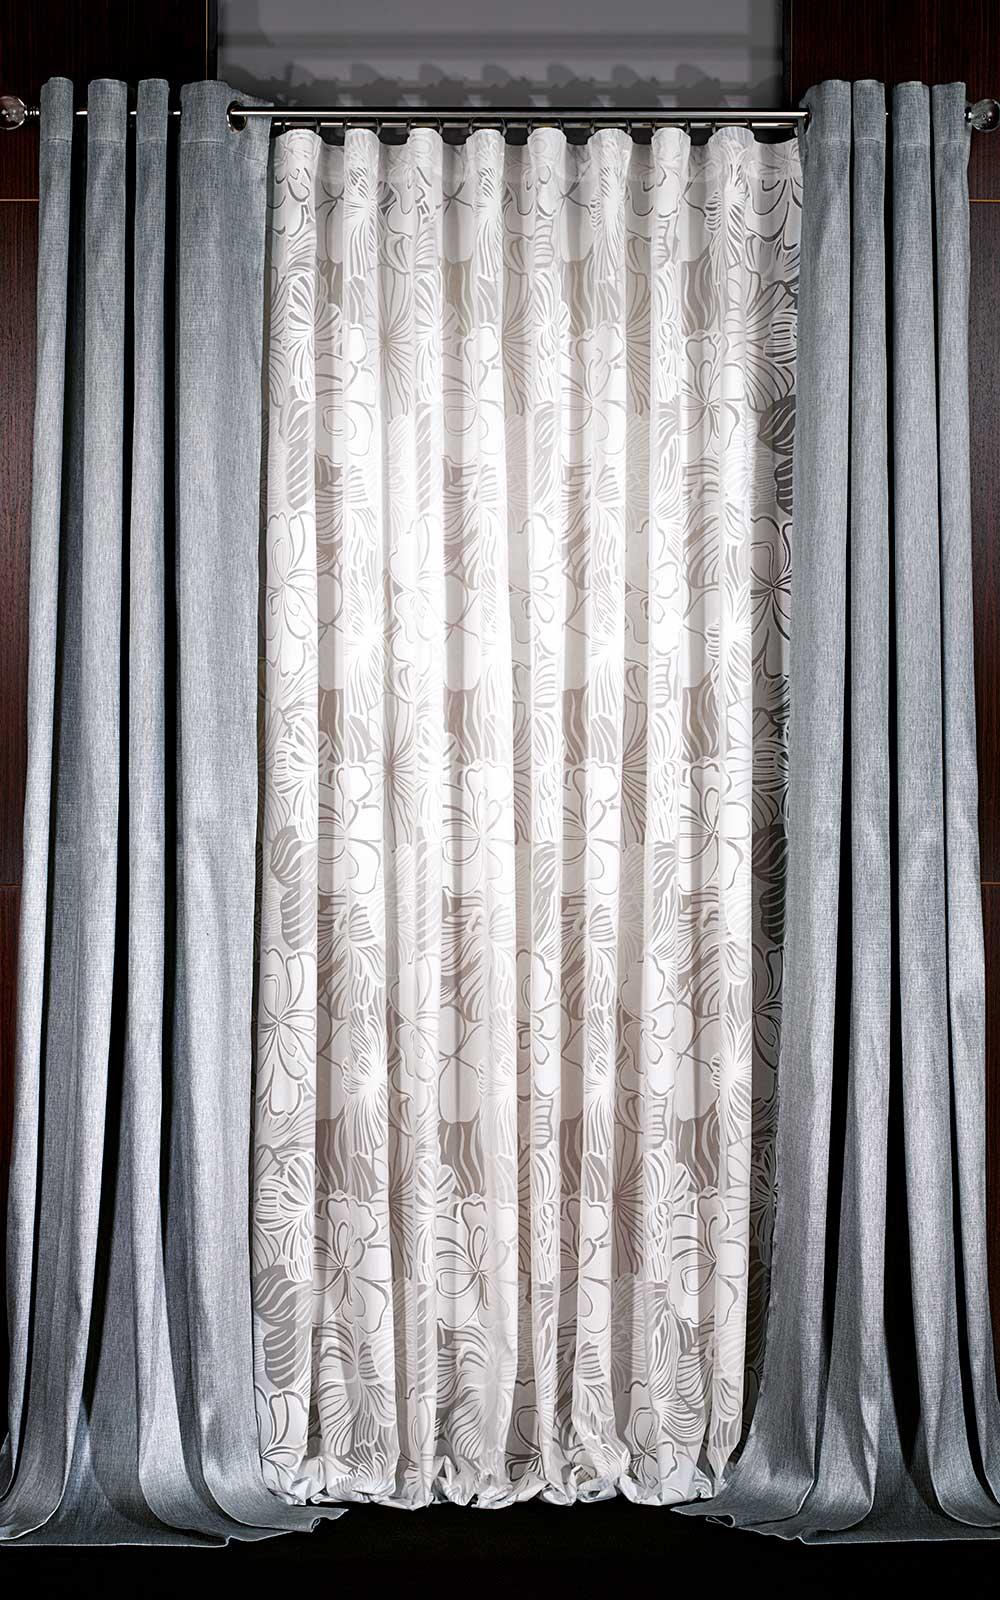 Trabajos realizados cortinajes com n for Cortinas gris plata